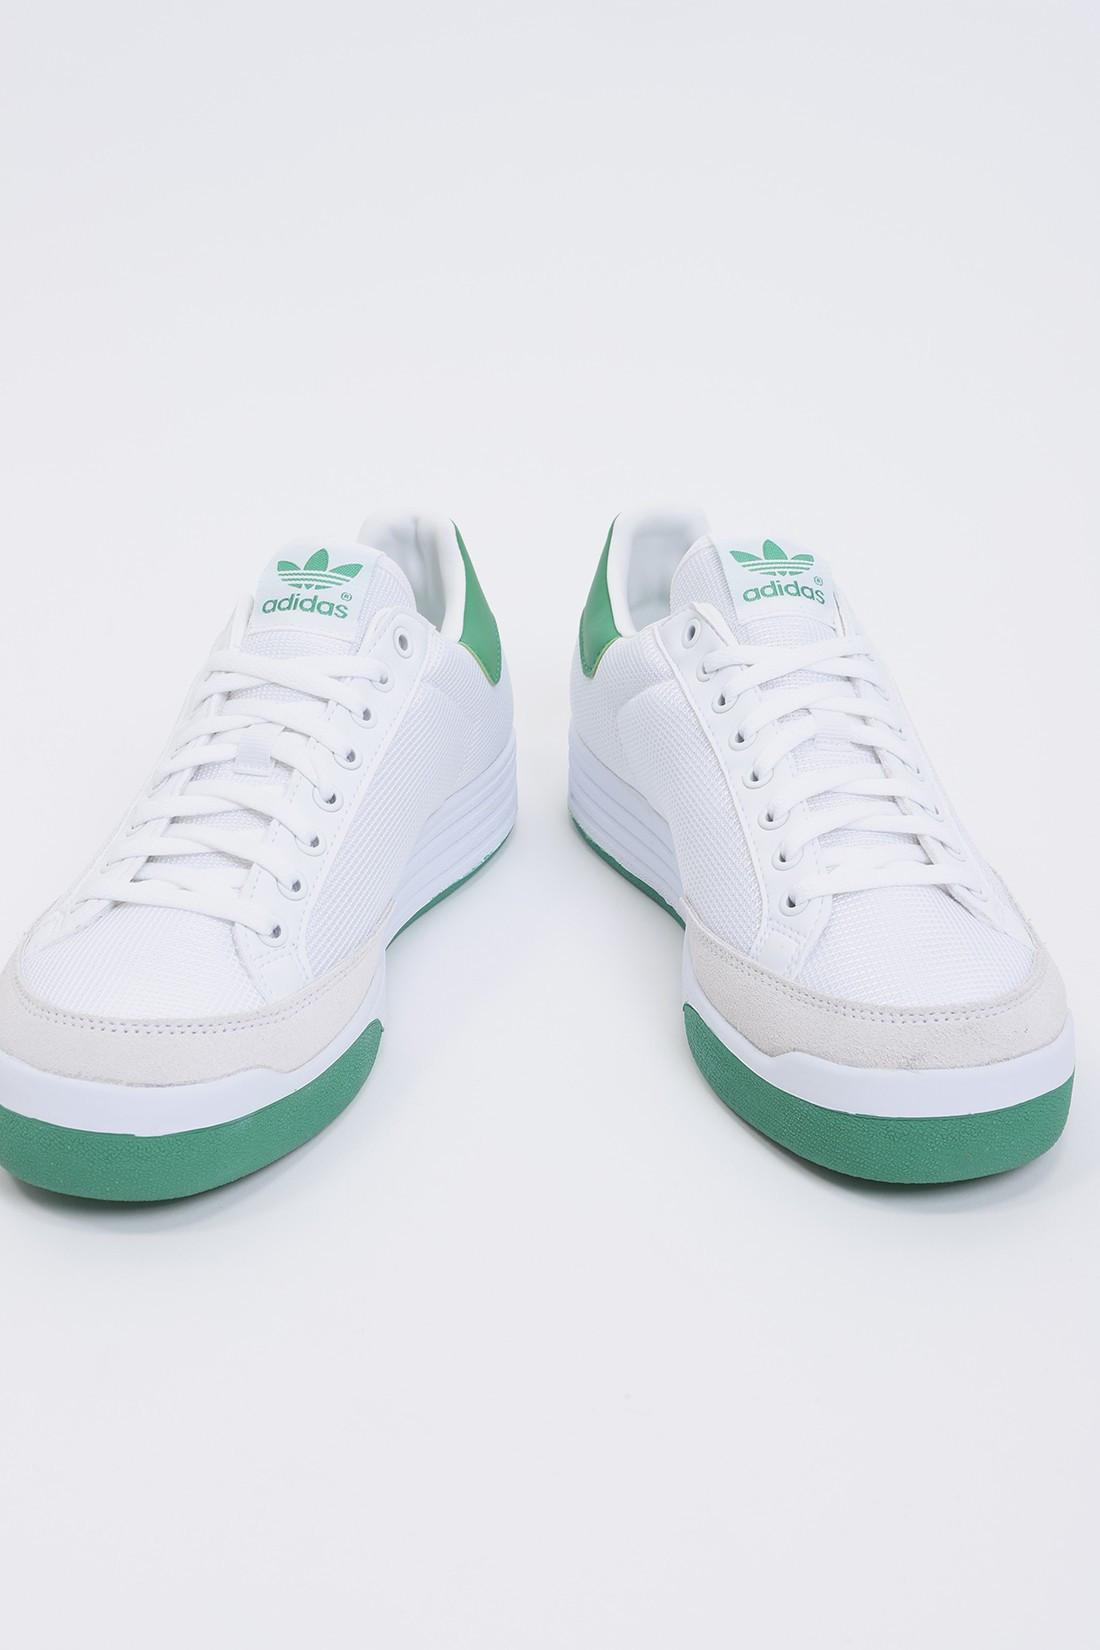 ADIDAS / Rod laver g99863 White / green